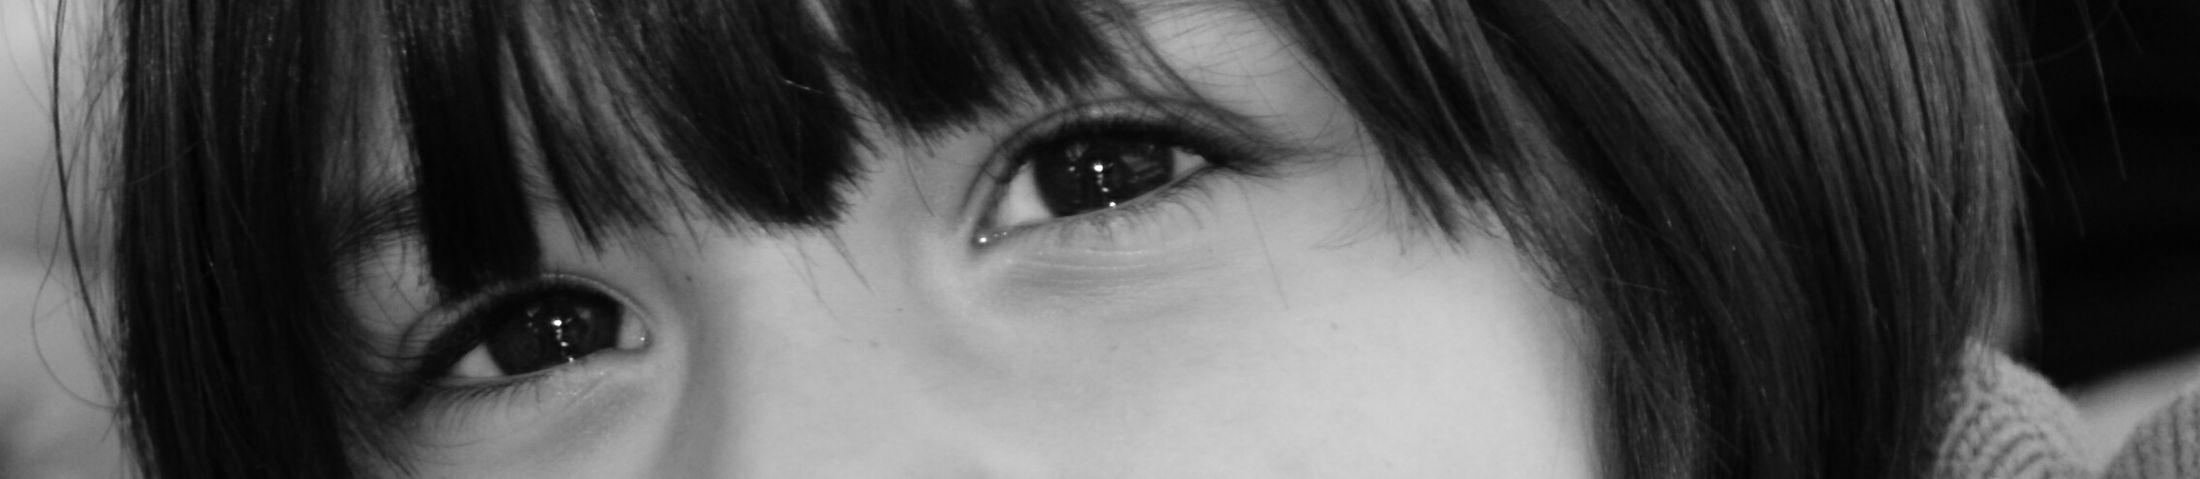 Real People People Family Blackandwhite Photography Black And White Passione_fotografica Eyes Eye4black&white  Eyes Are Soul Reflection Popolari Sguardi Intensi Sguardoprofondo Sguardo  Sguardi